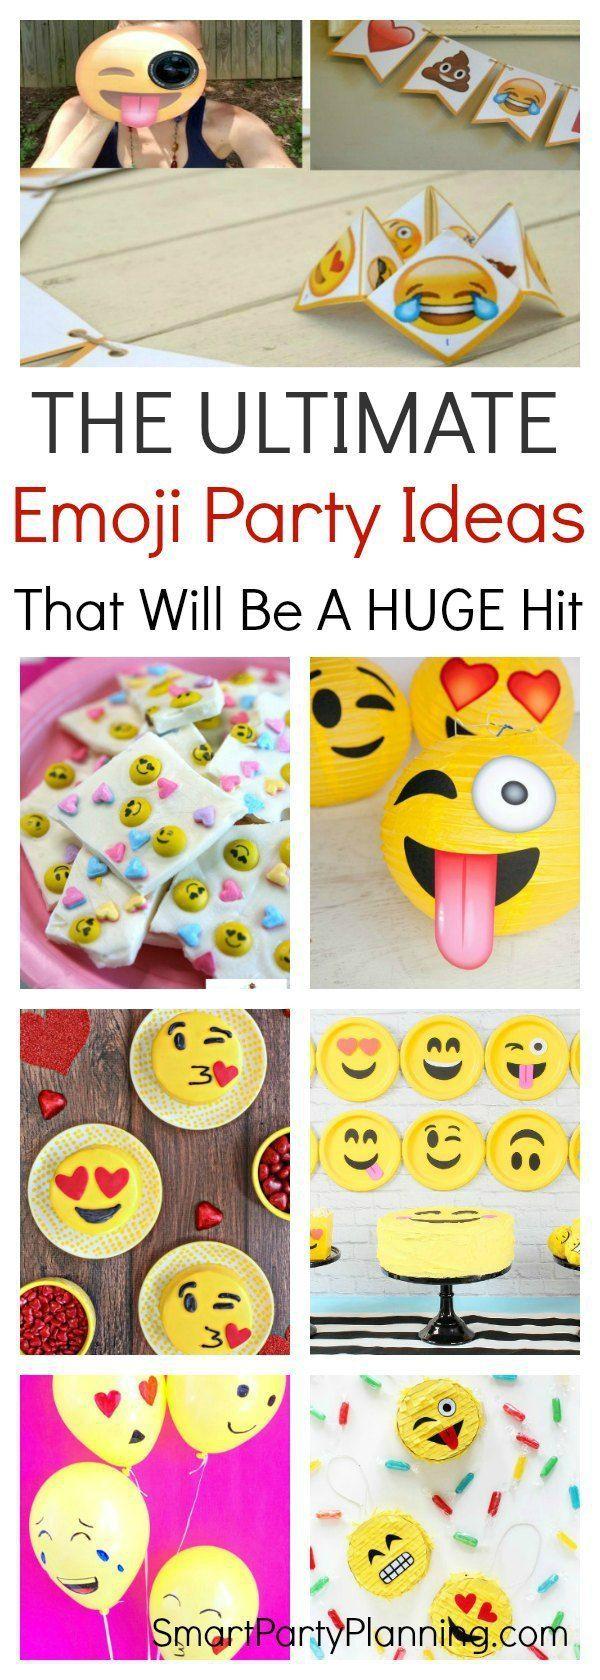 Best 25+ Emoji games ideas on Pinterest | Tween party ...